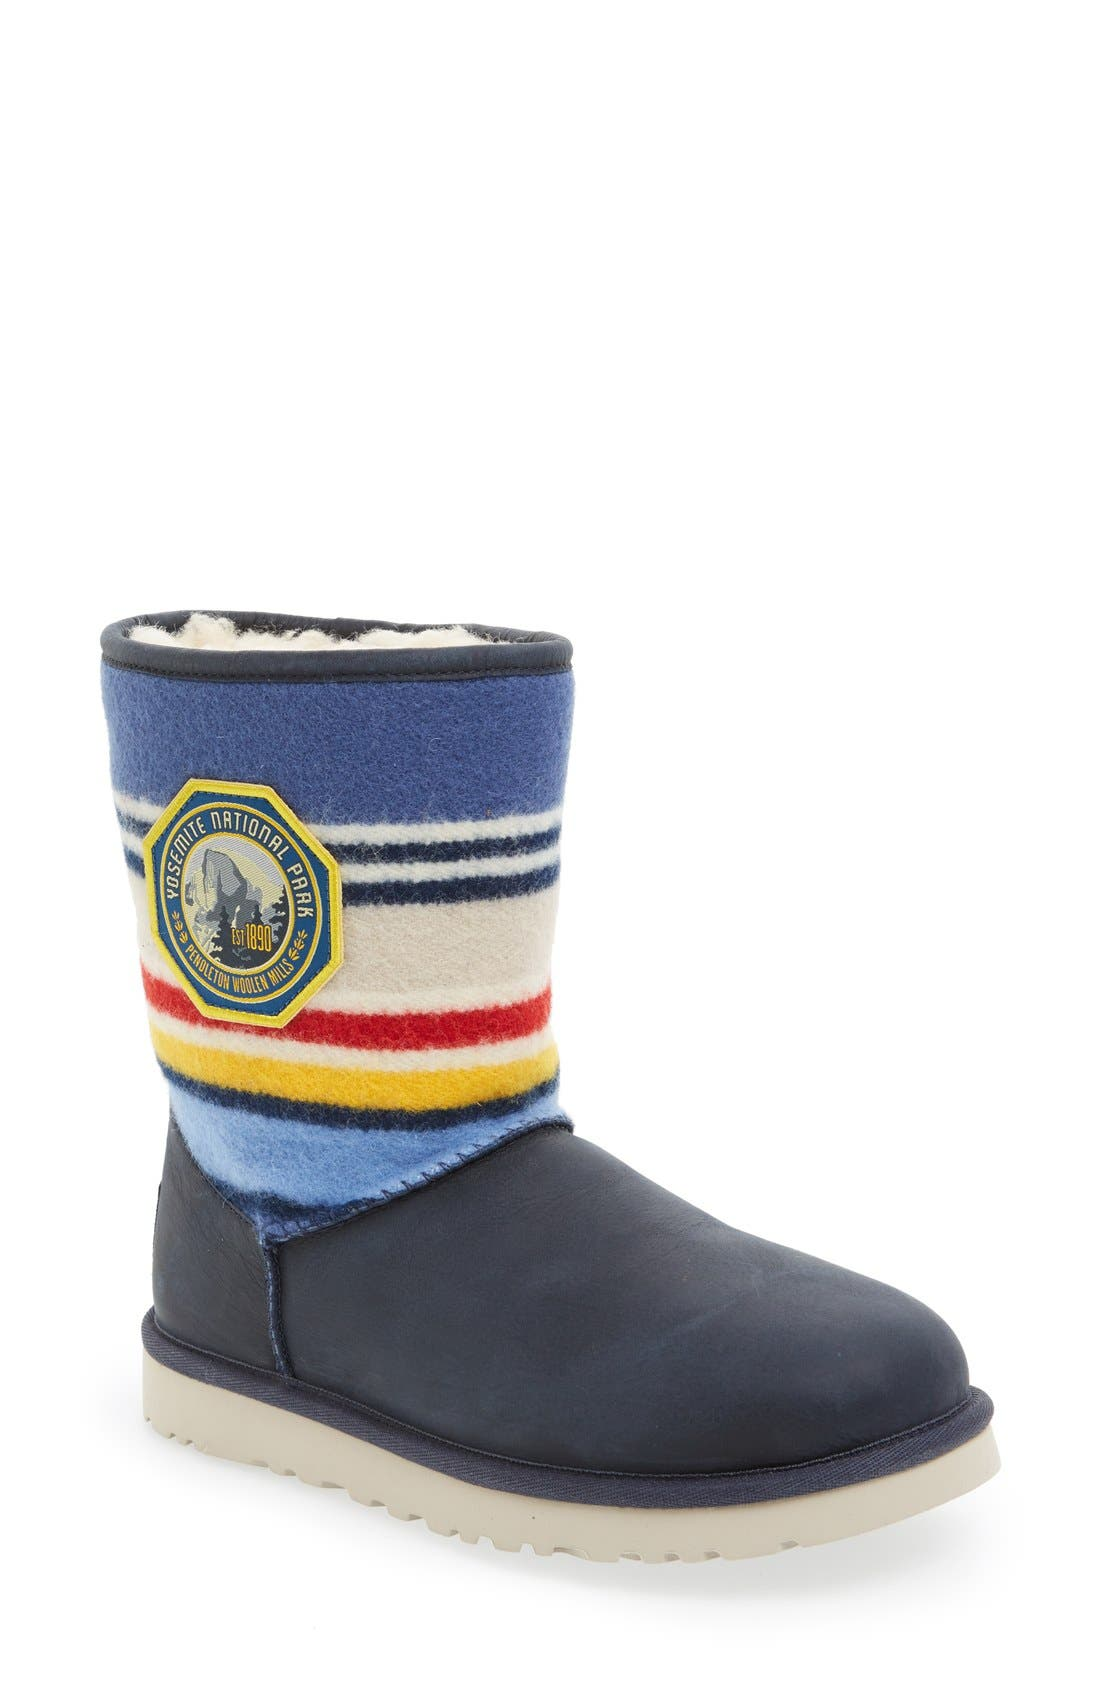 x Pendleton 'Classic Short - Yosemite' Boot, Main, color, 400